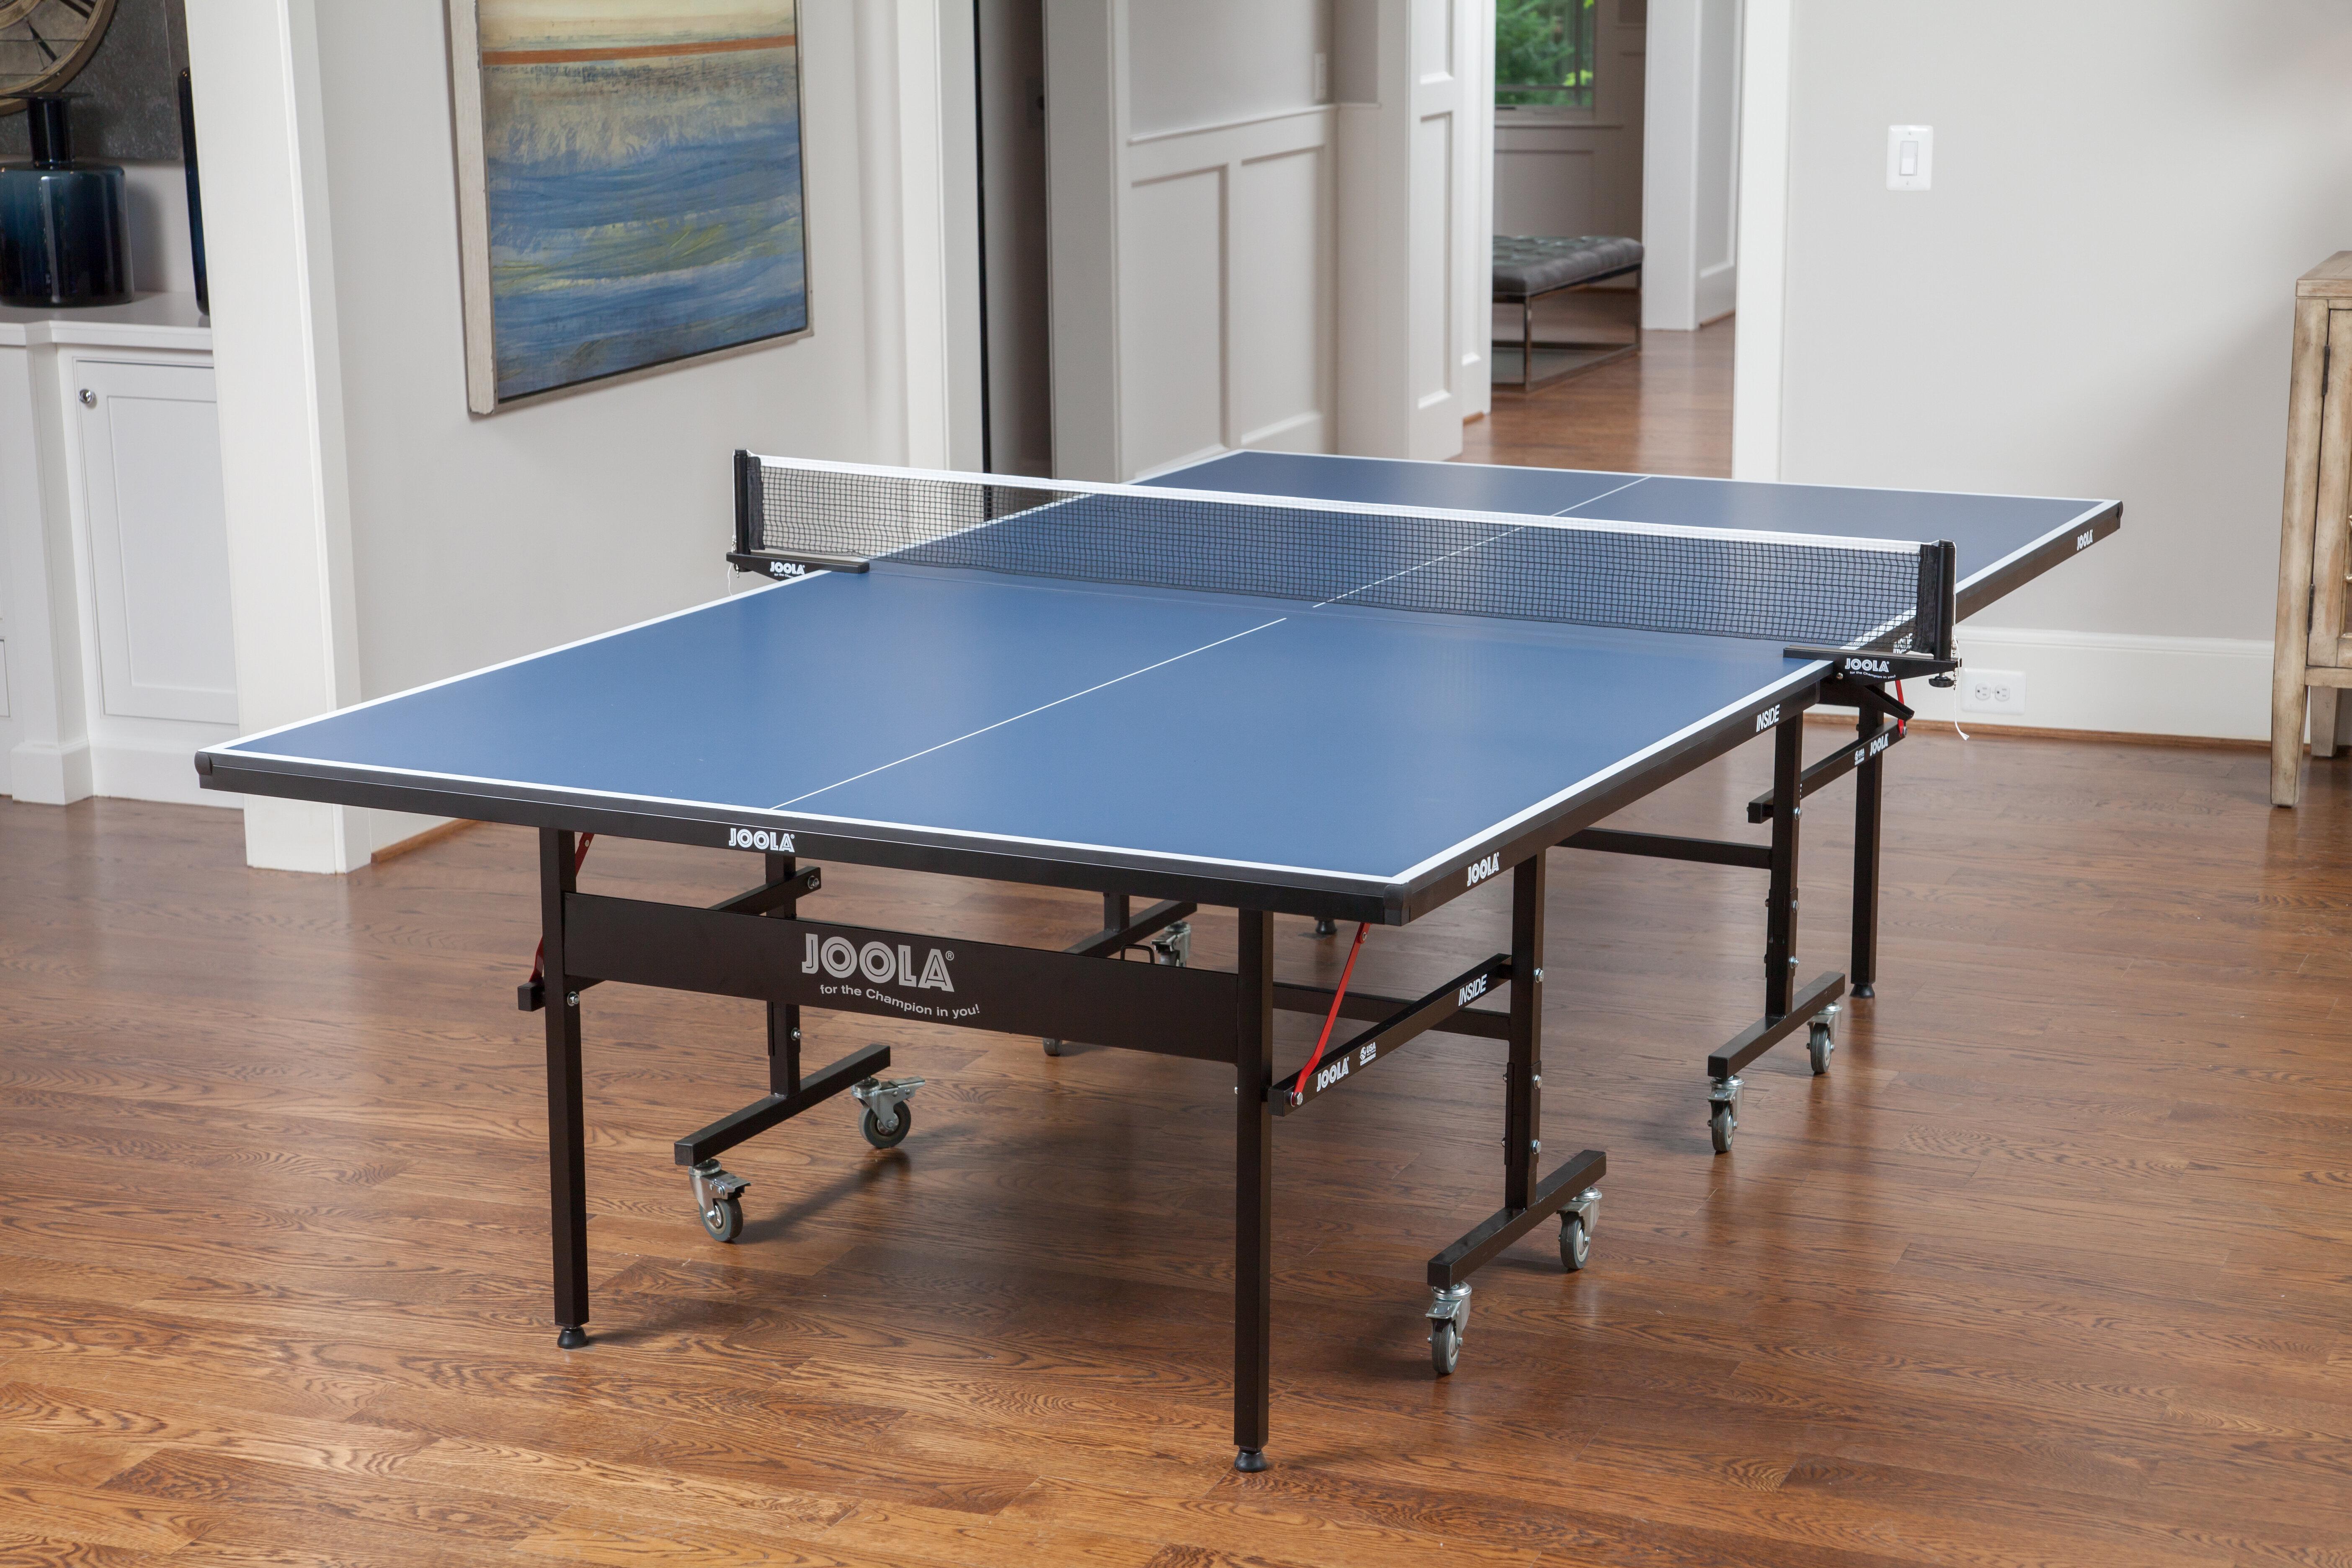 44097379e JOOLA Tour Regulation Size Foldable Table Tennis Table   Reviews ...